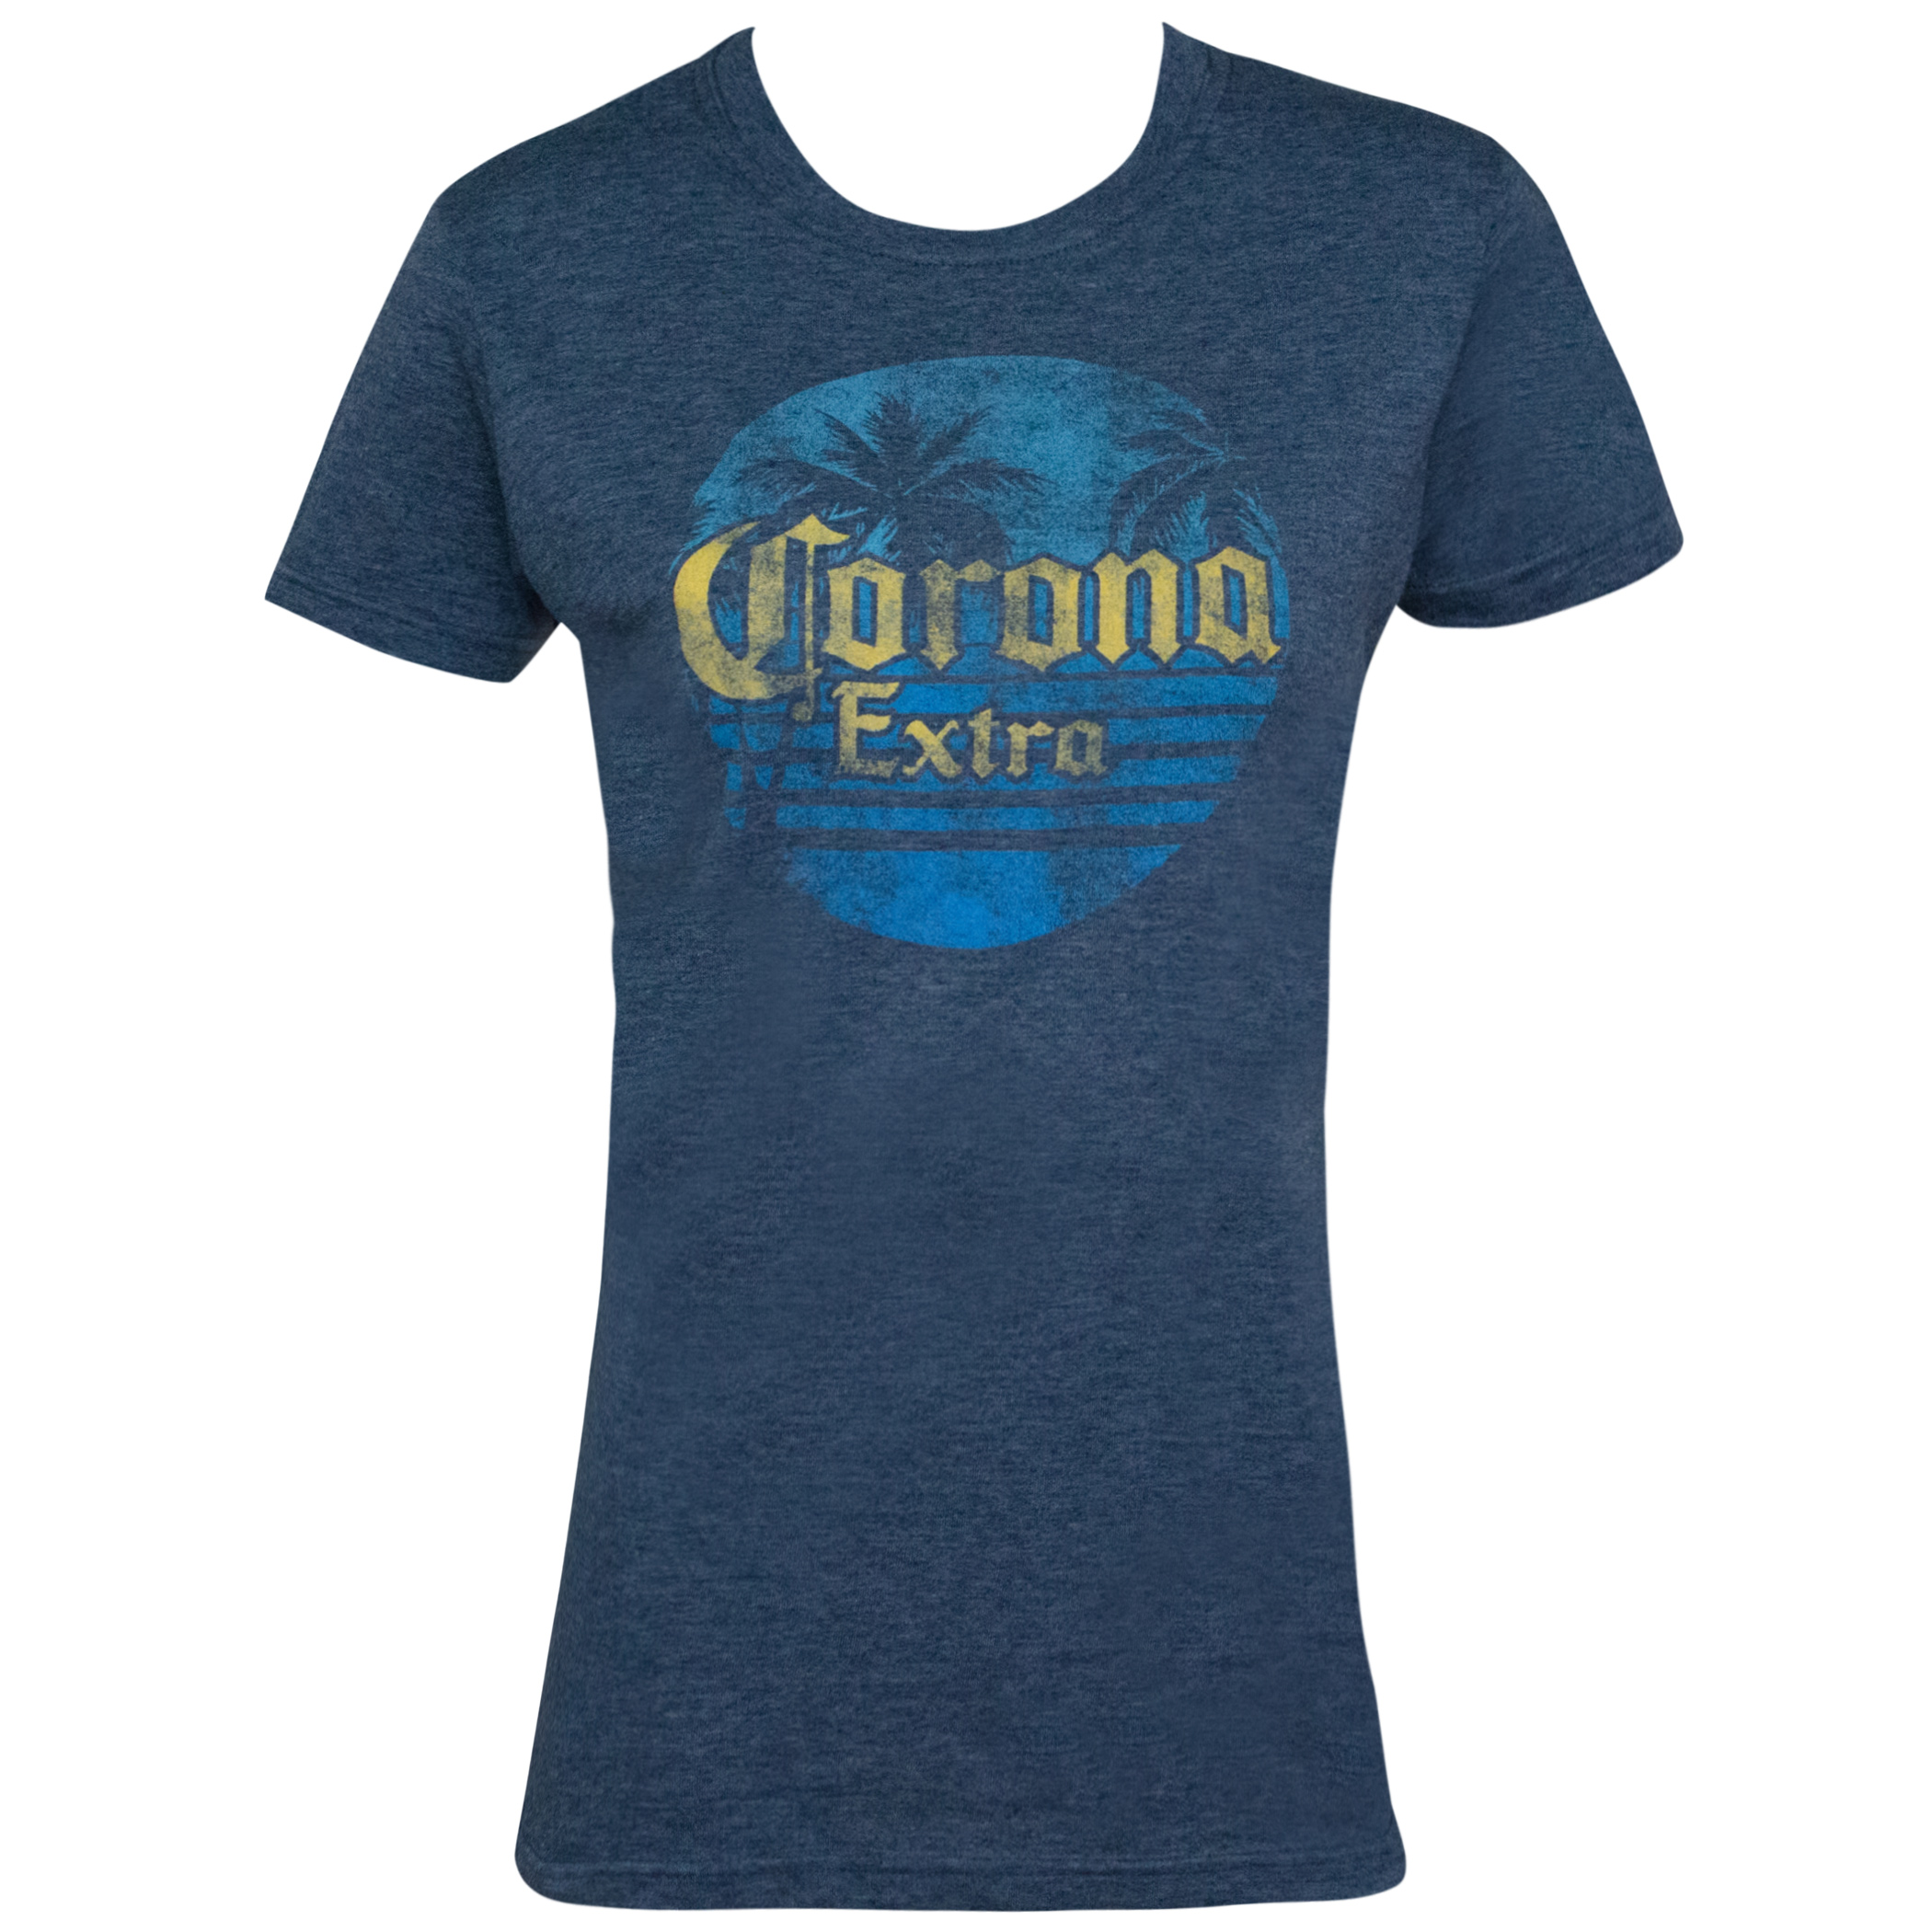 Corona Extra Sunset Logo Blue Women's Tee Shirt